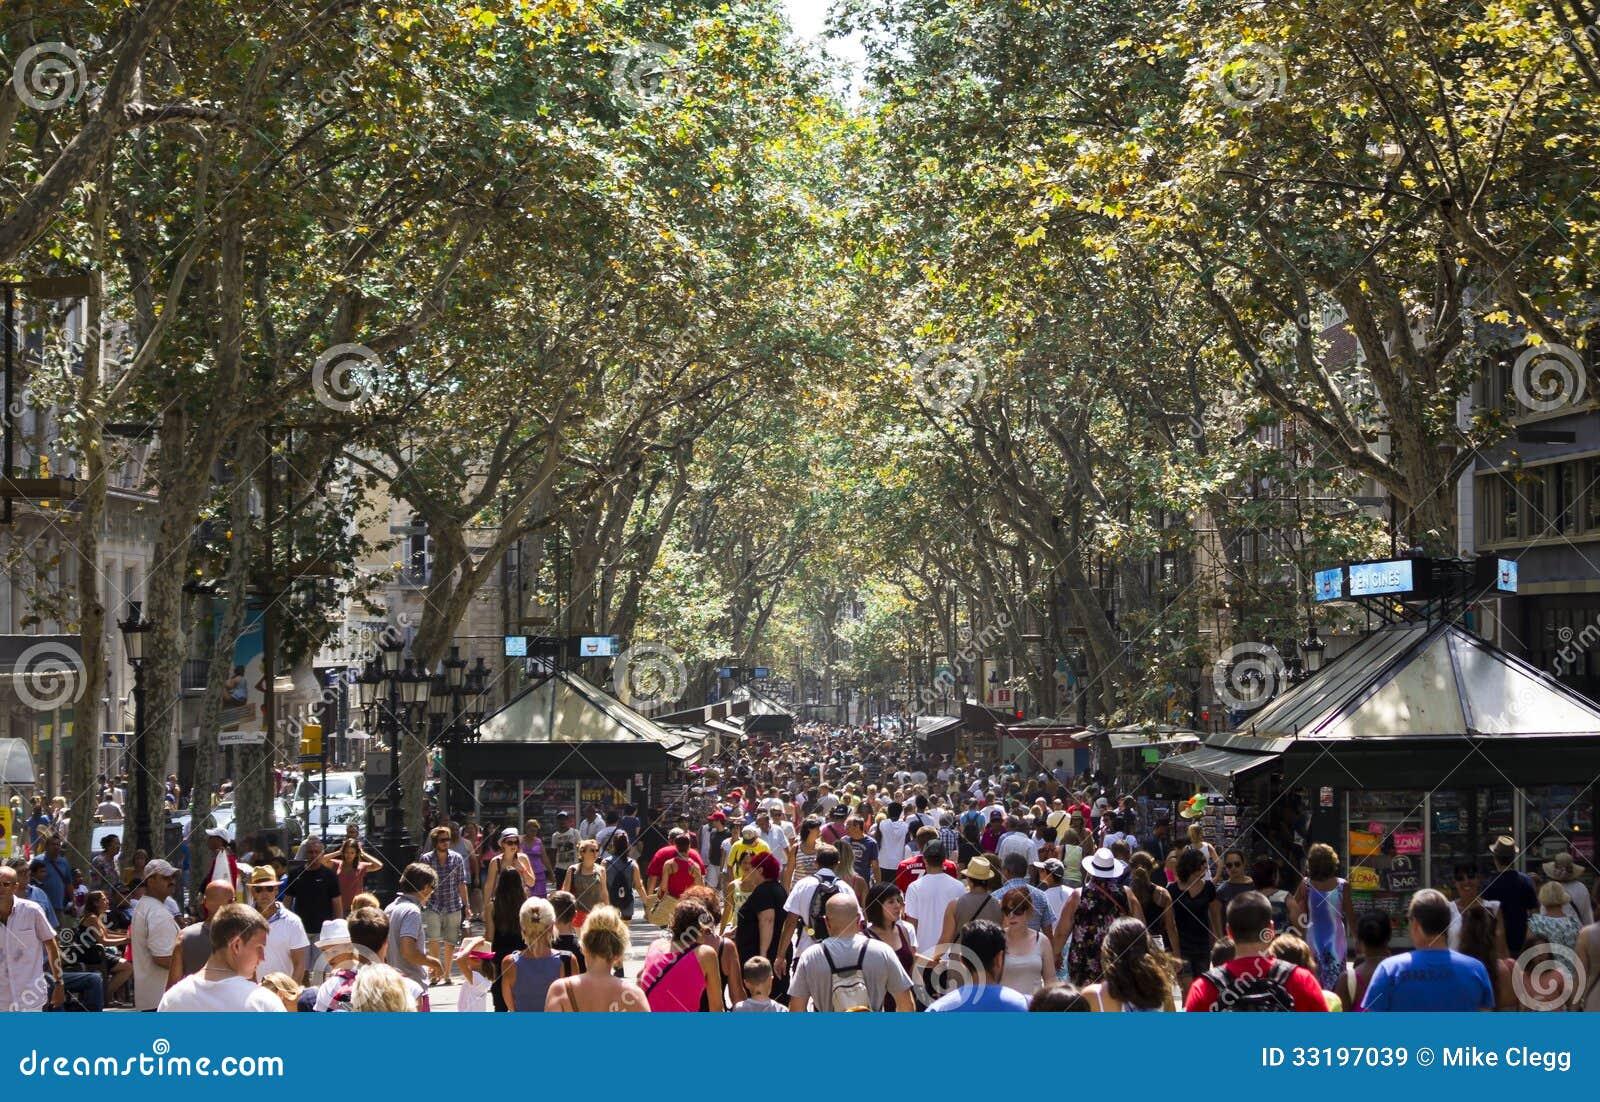 La Rambla Crowd Editorial Stock Image - Image: 33197039